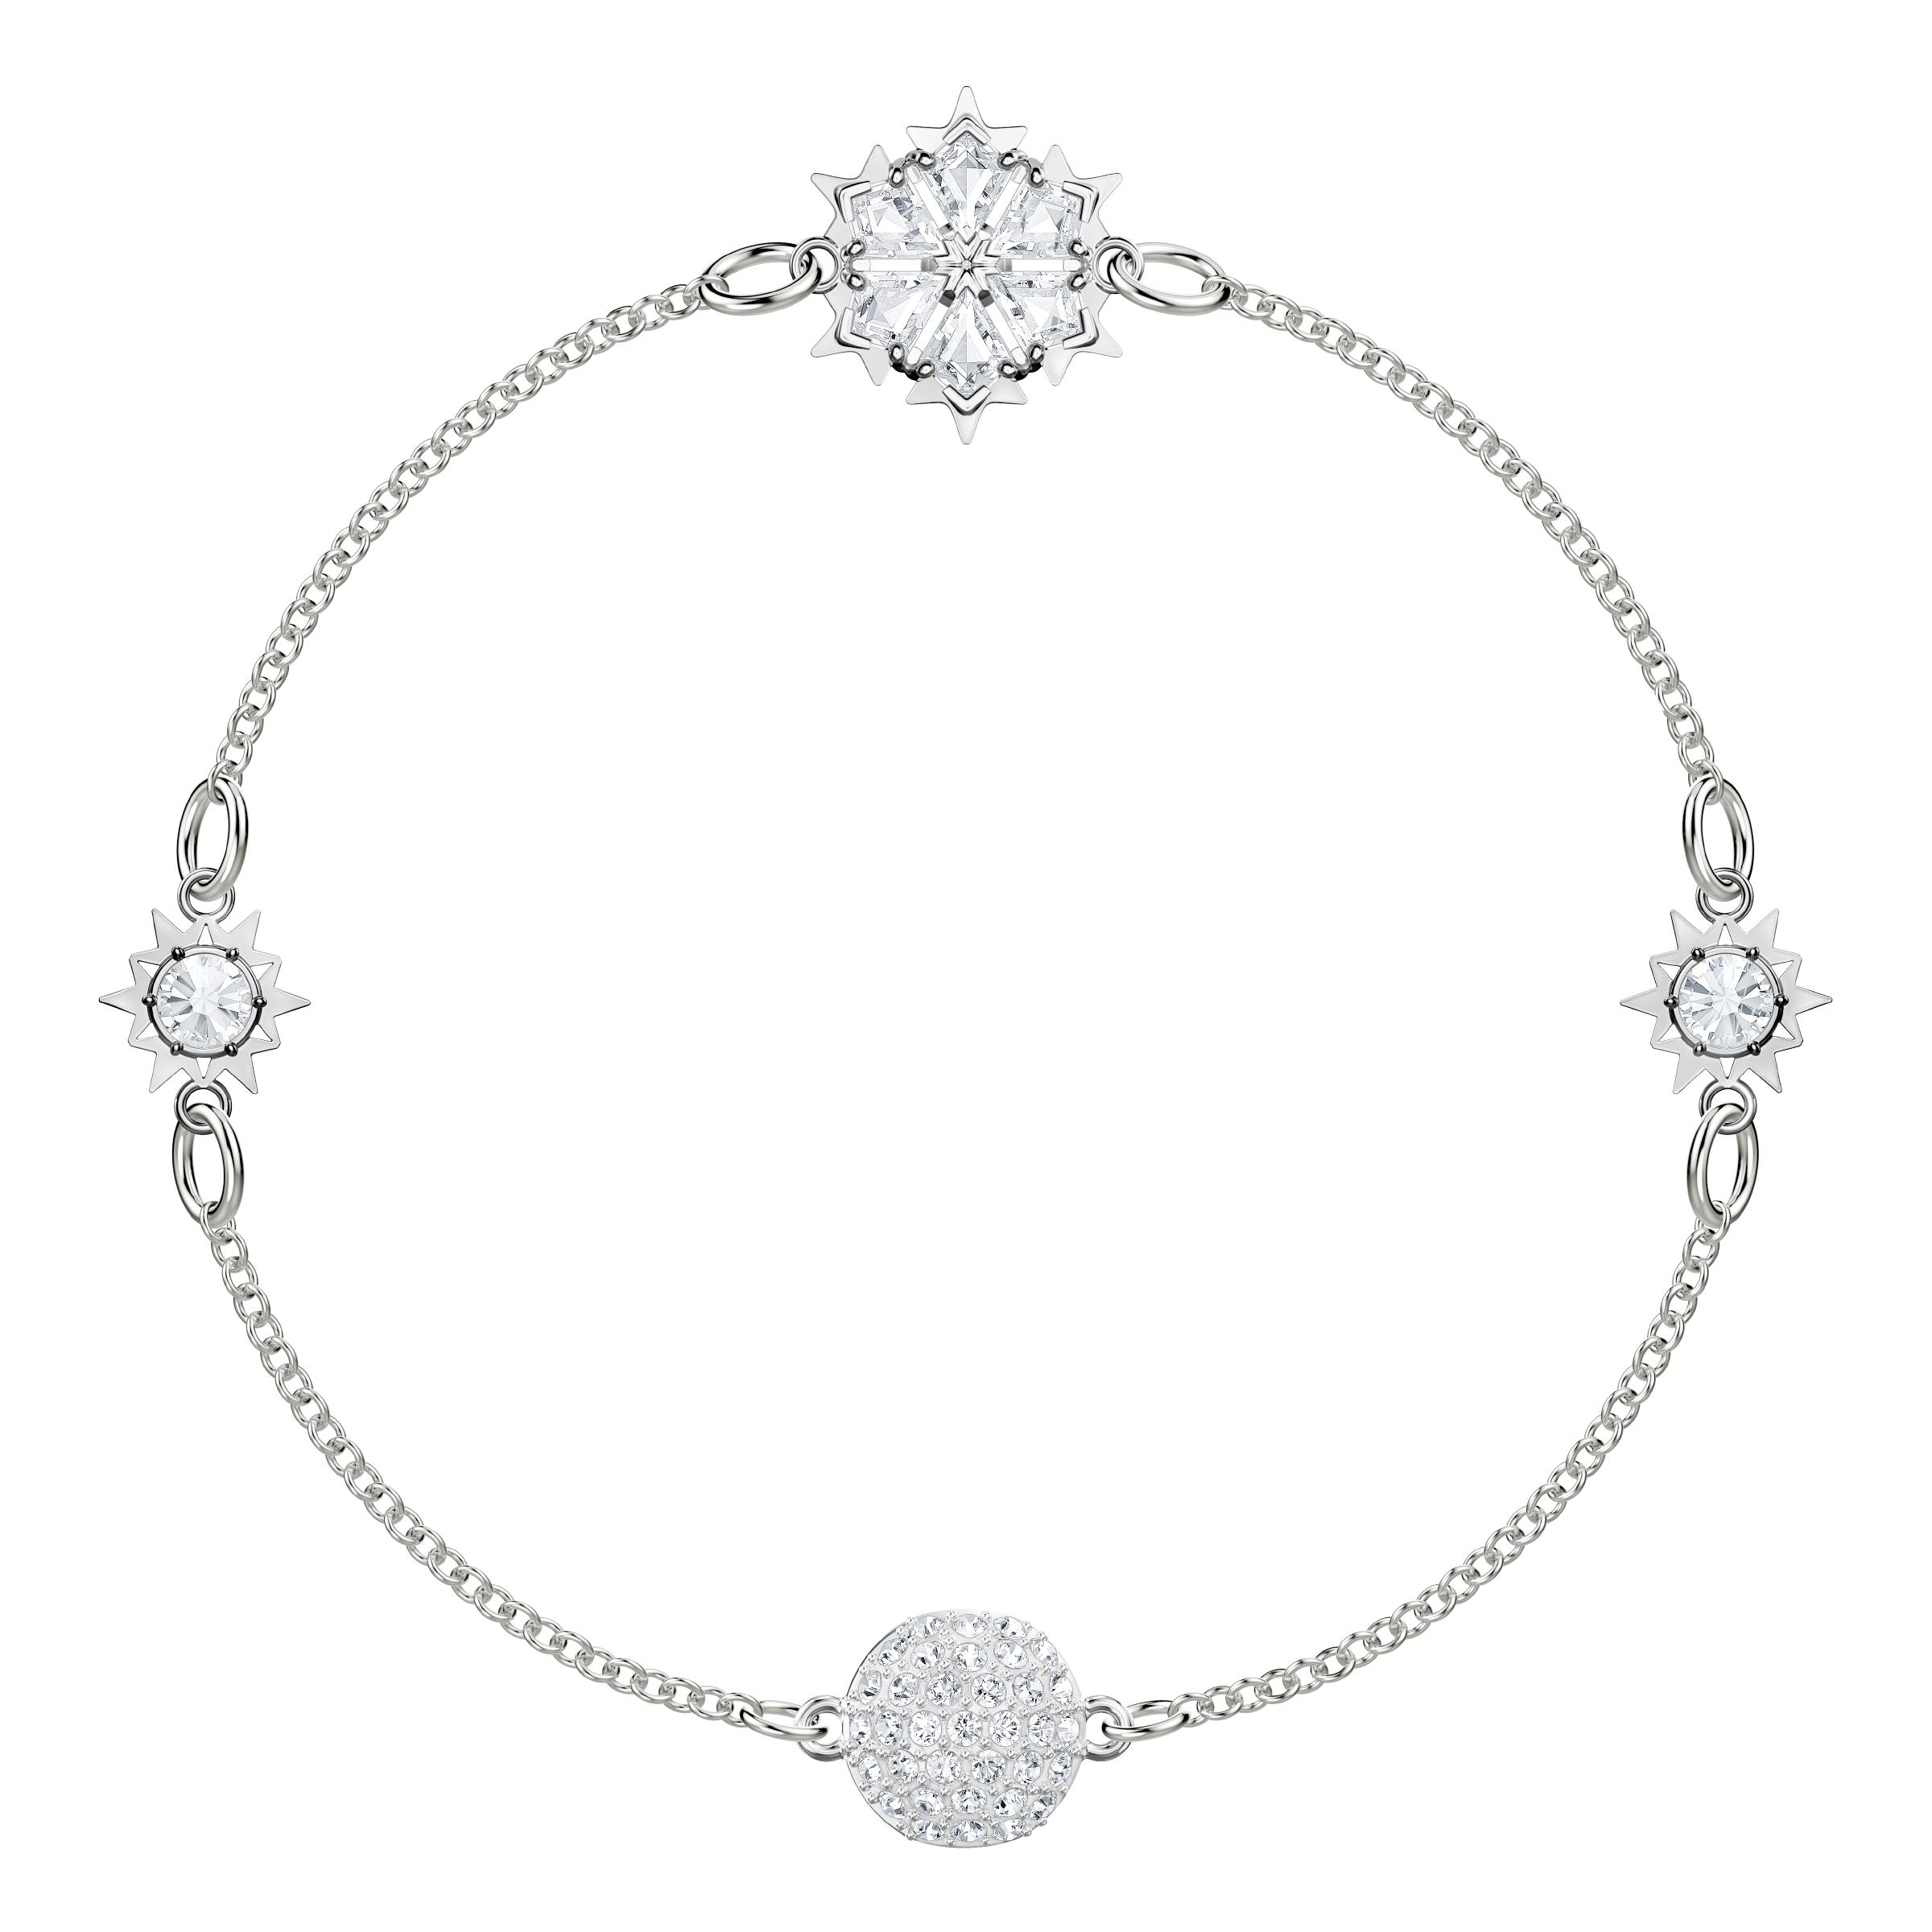 Swarovski Remix Collection Snowflake, White, Rhodium Plating